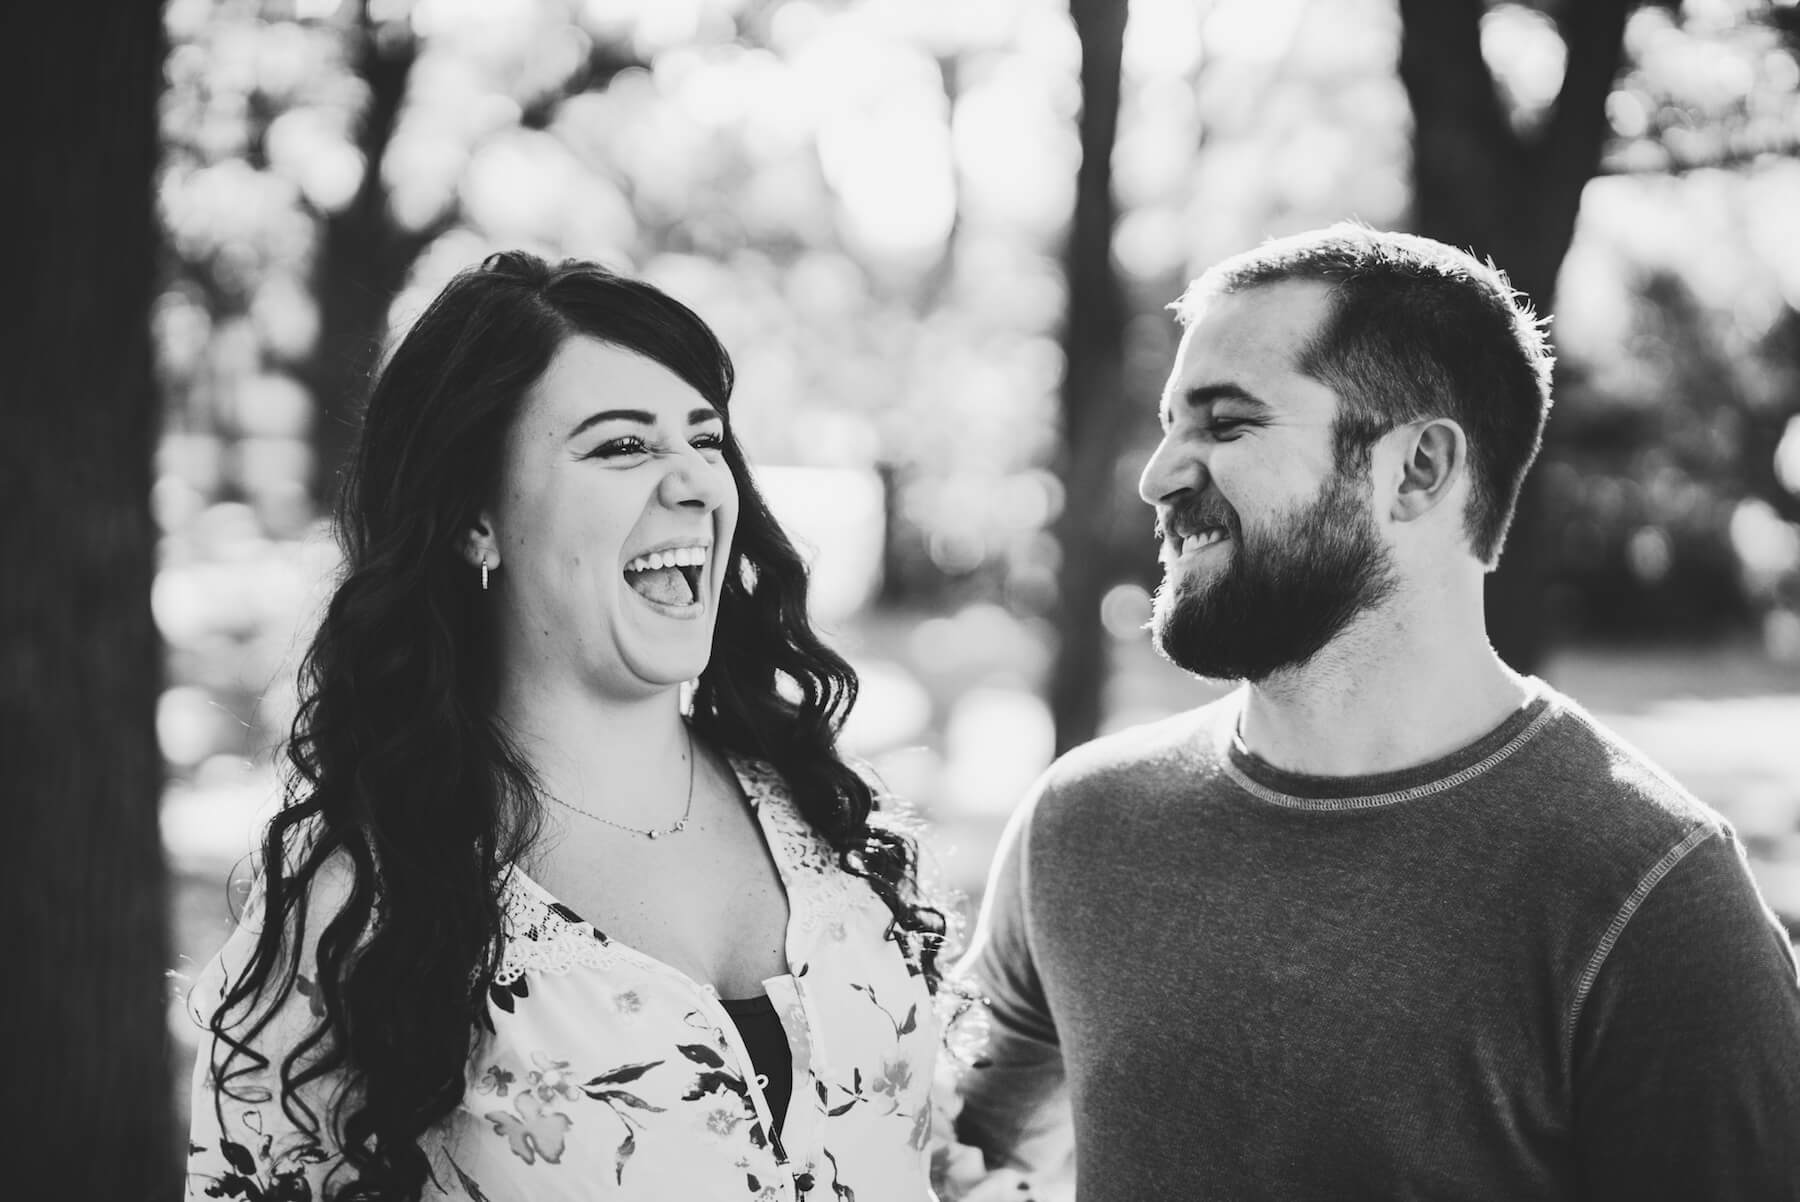 Engle-Olson-Chad-Jen-Engagement-8.jpg